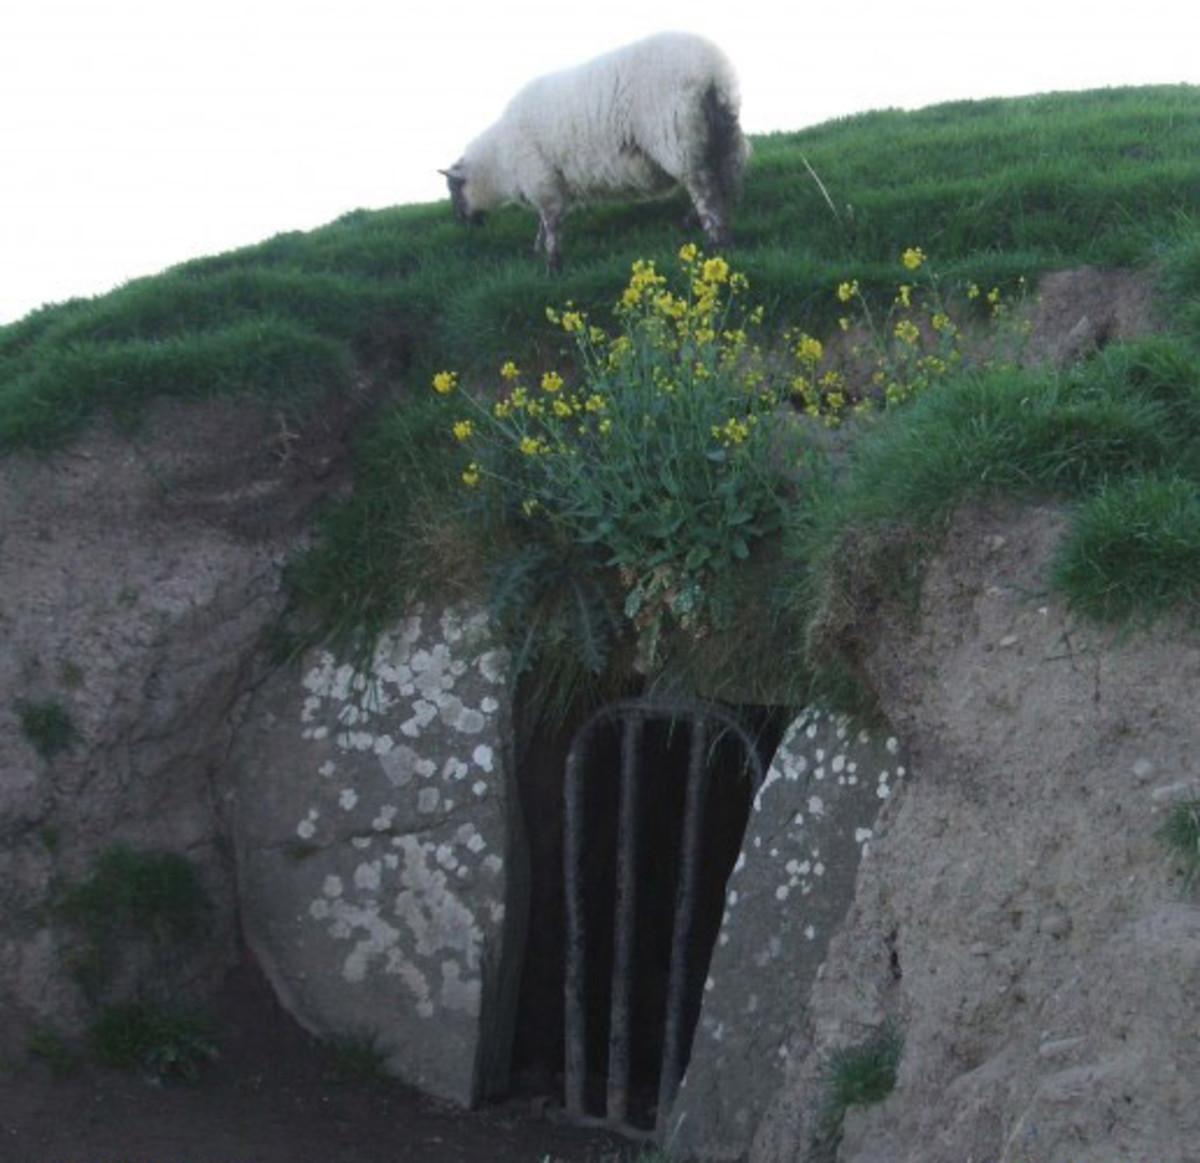 St. Patrick's Day - Famous Haunted Irish Castles